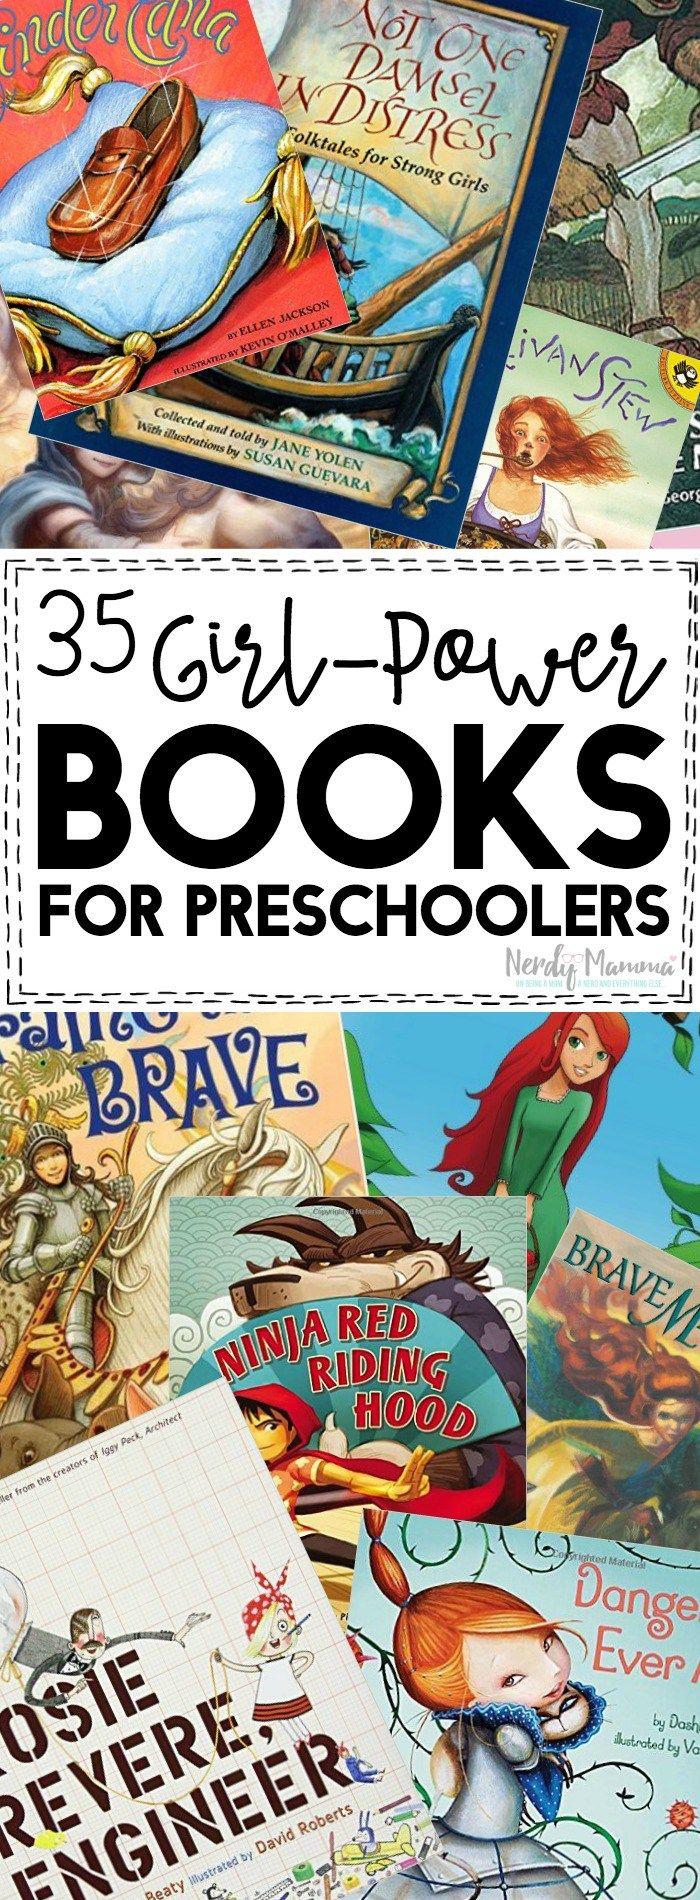 345 best get best books for kids images on pinterest kid